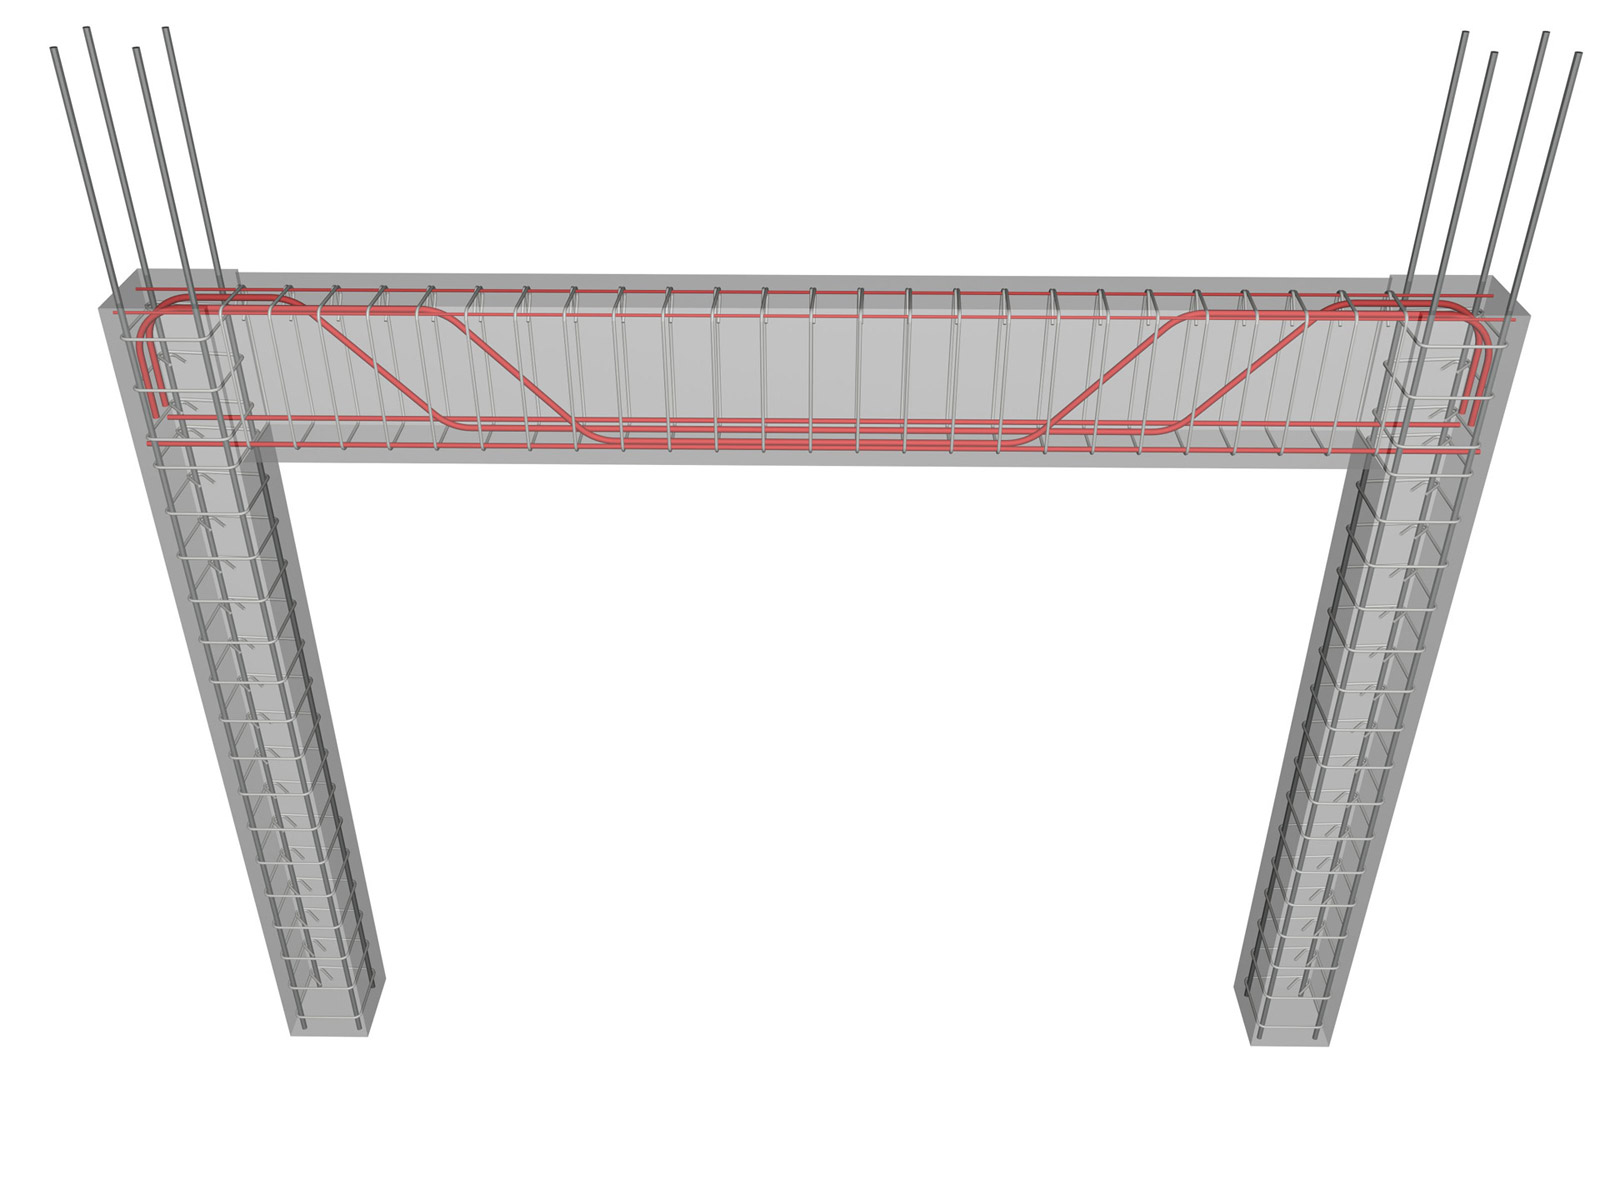 concrete frame construction method